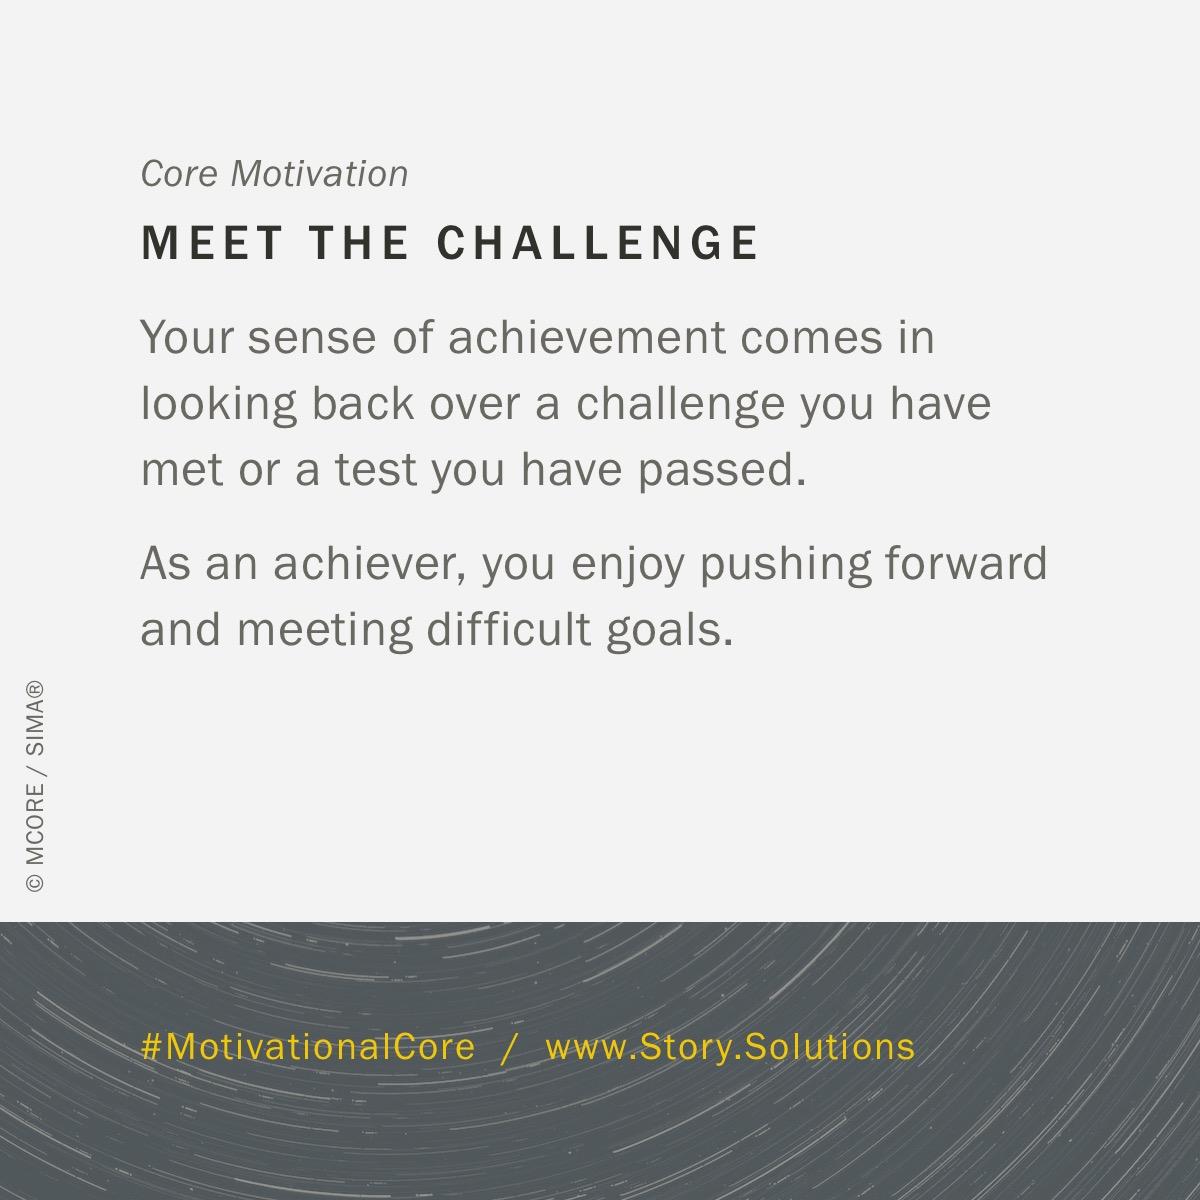 story-solutions-motivational-core-meet-the-challenge-4.jpeg